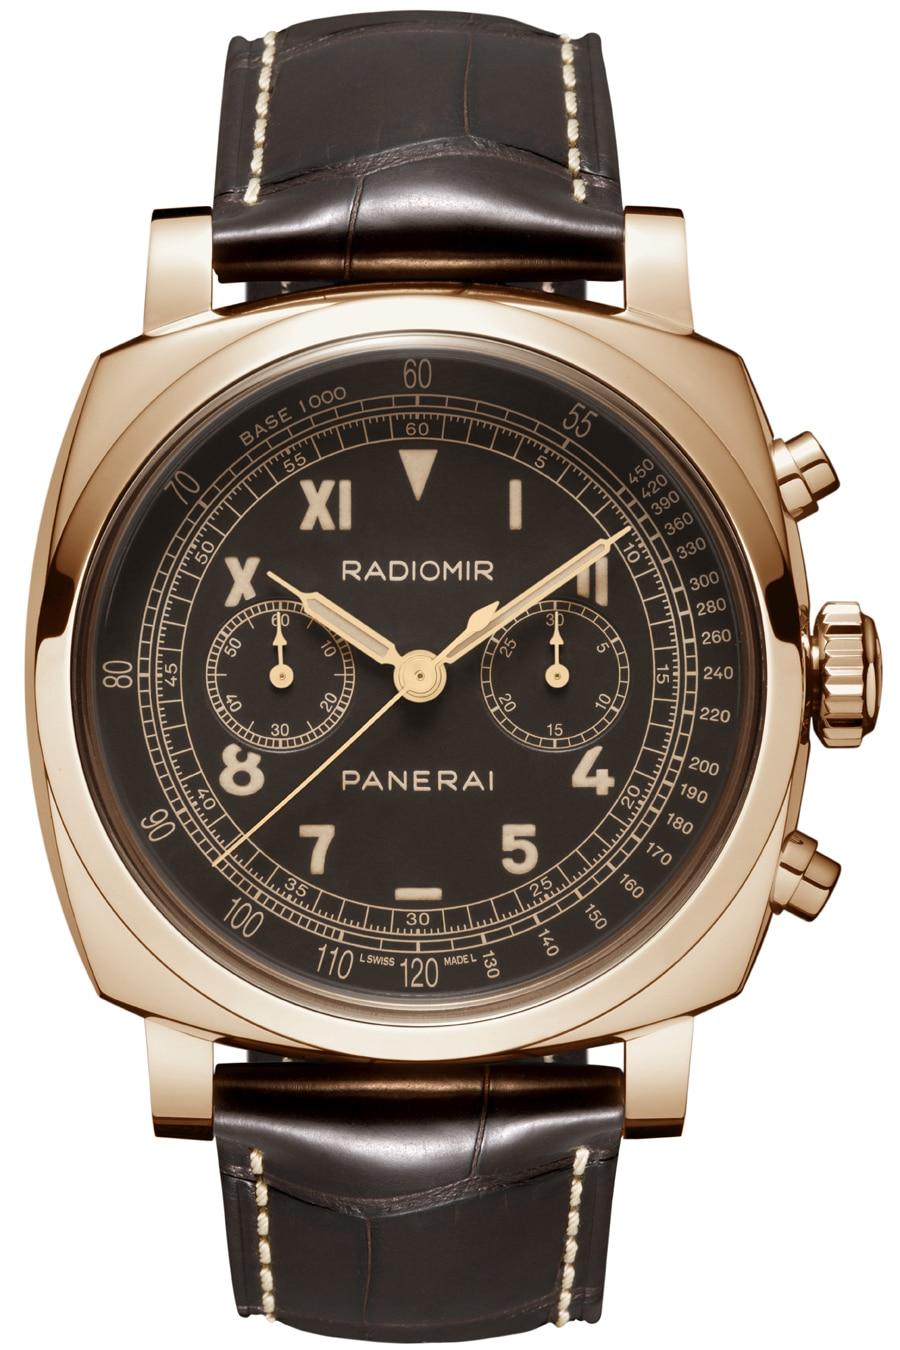 Panerai: Radiomir 1940 Chronograph Oro Rosso